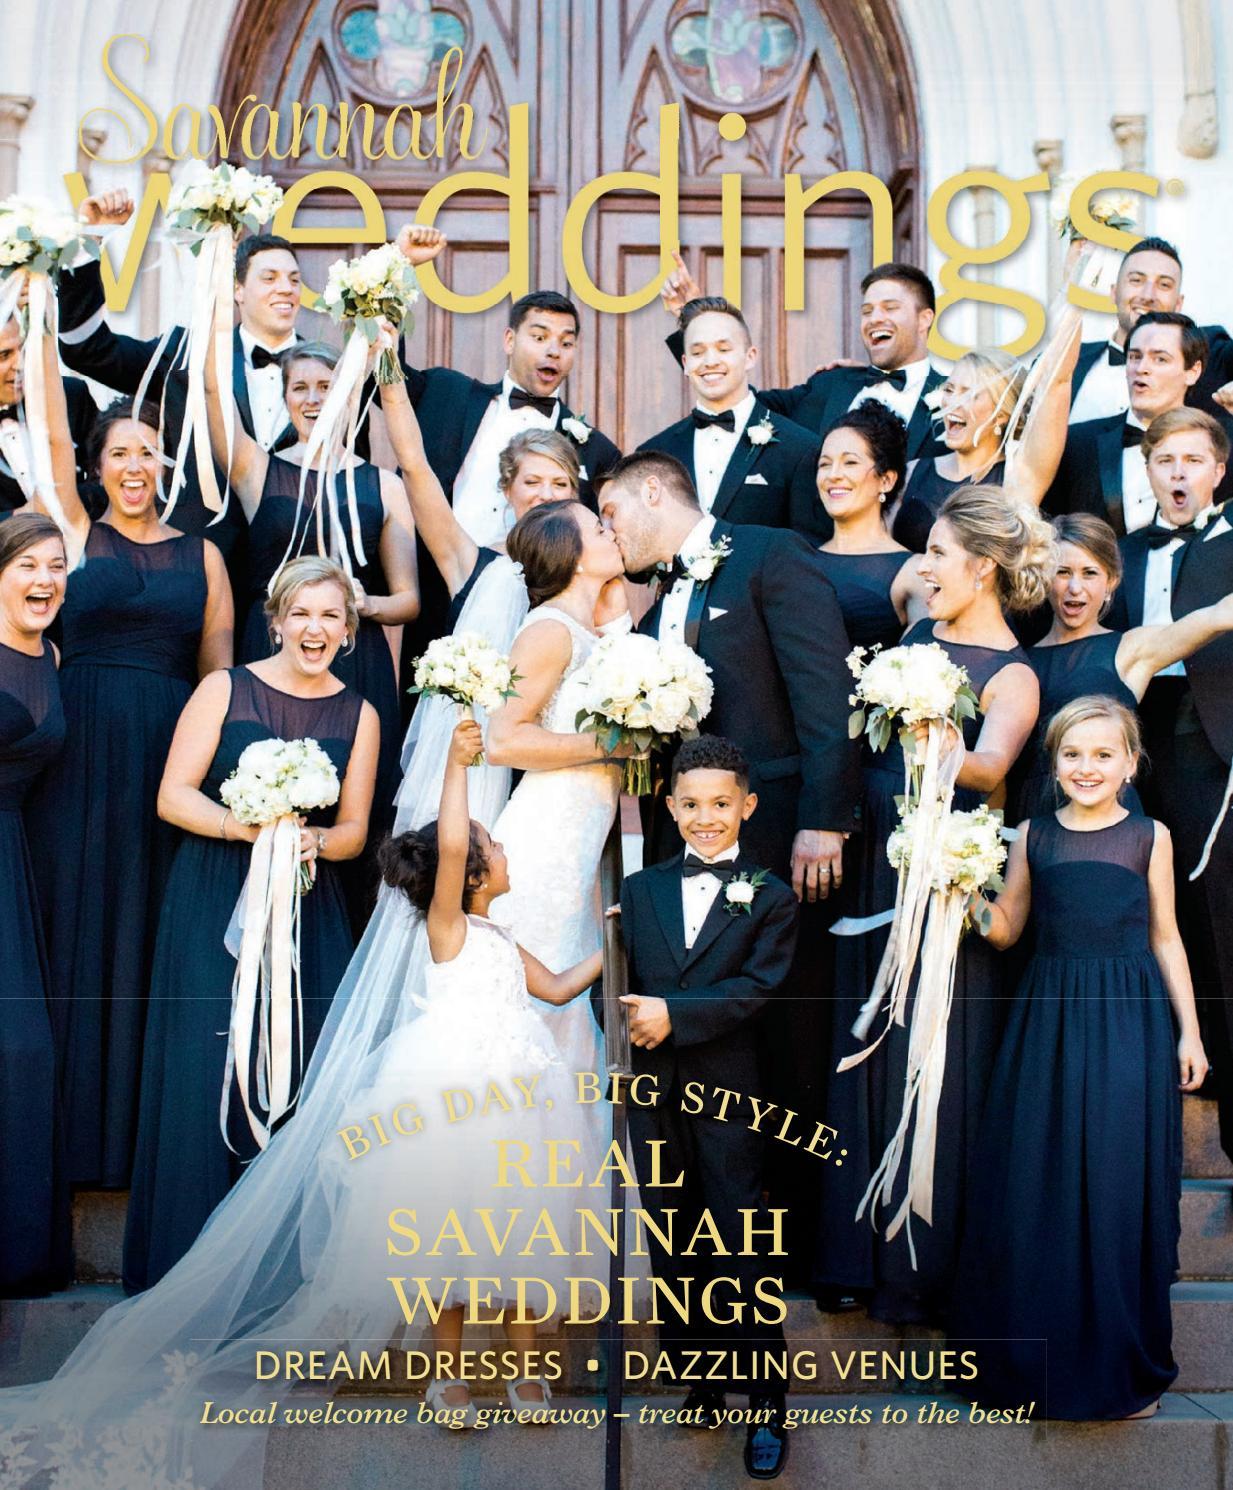 79f6a918a867 Savannah Weddings Magazine - Fall Winter 2017-2018 by Savannah Magazine -  issuu